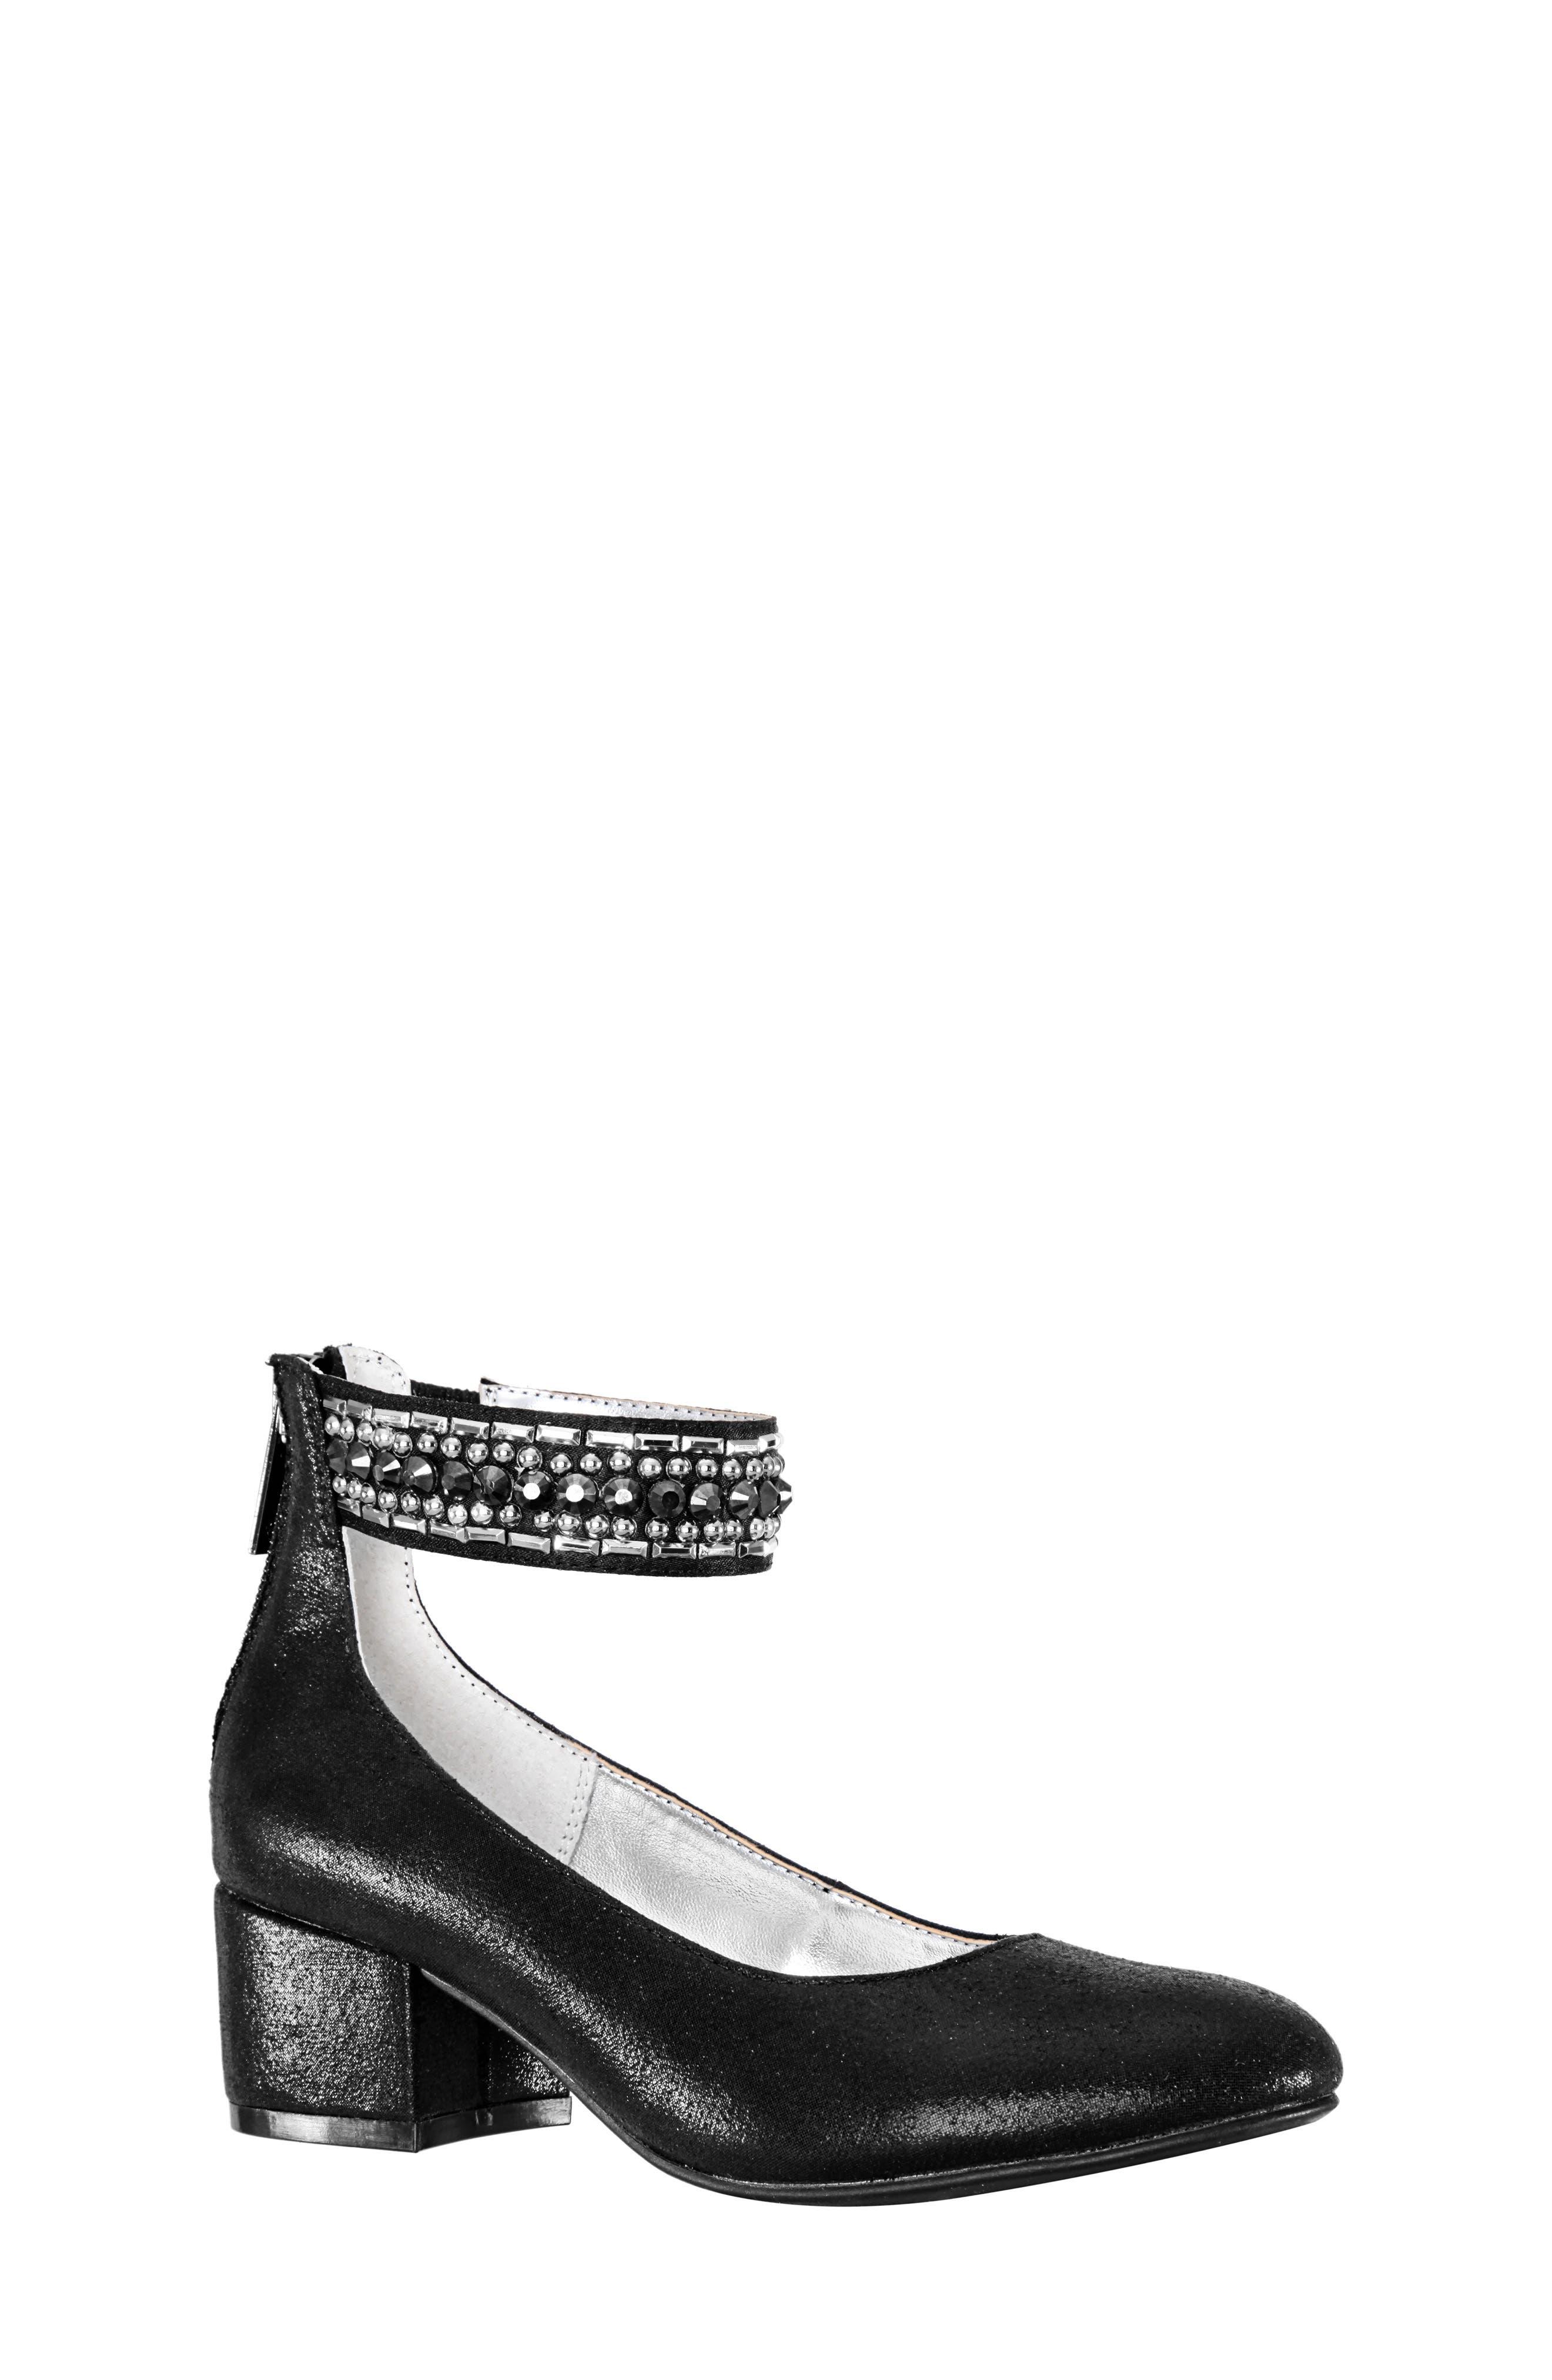 Charleen Ankle Strap Pump,                             Main thumbnail 1, color,                             BLACK SHIMMER FABRIC